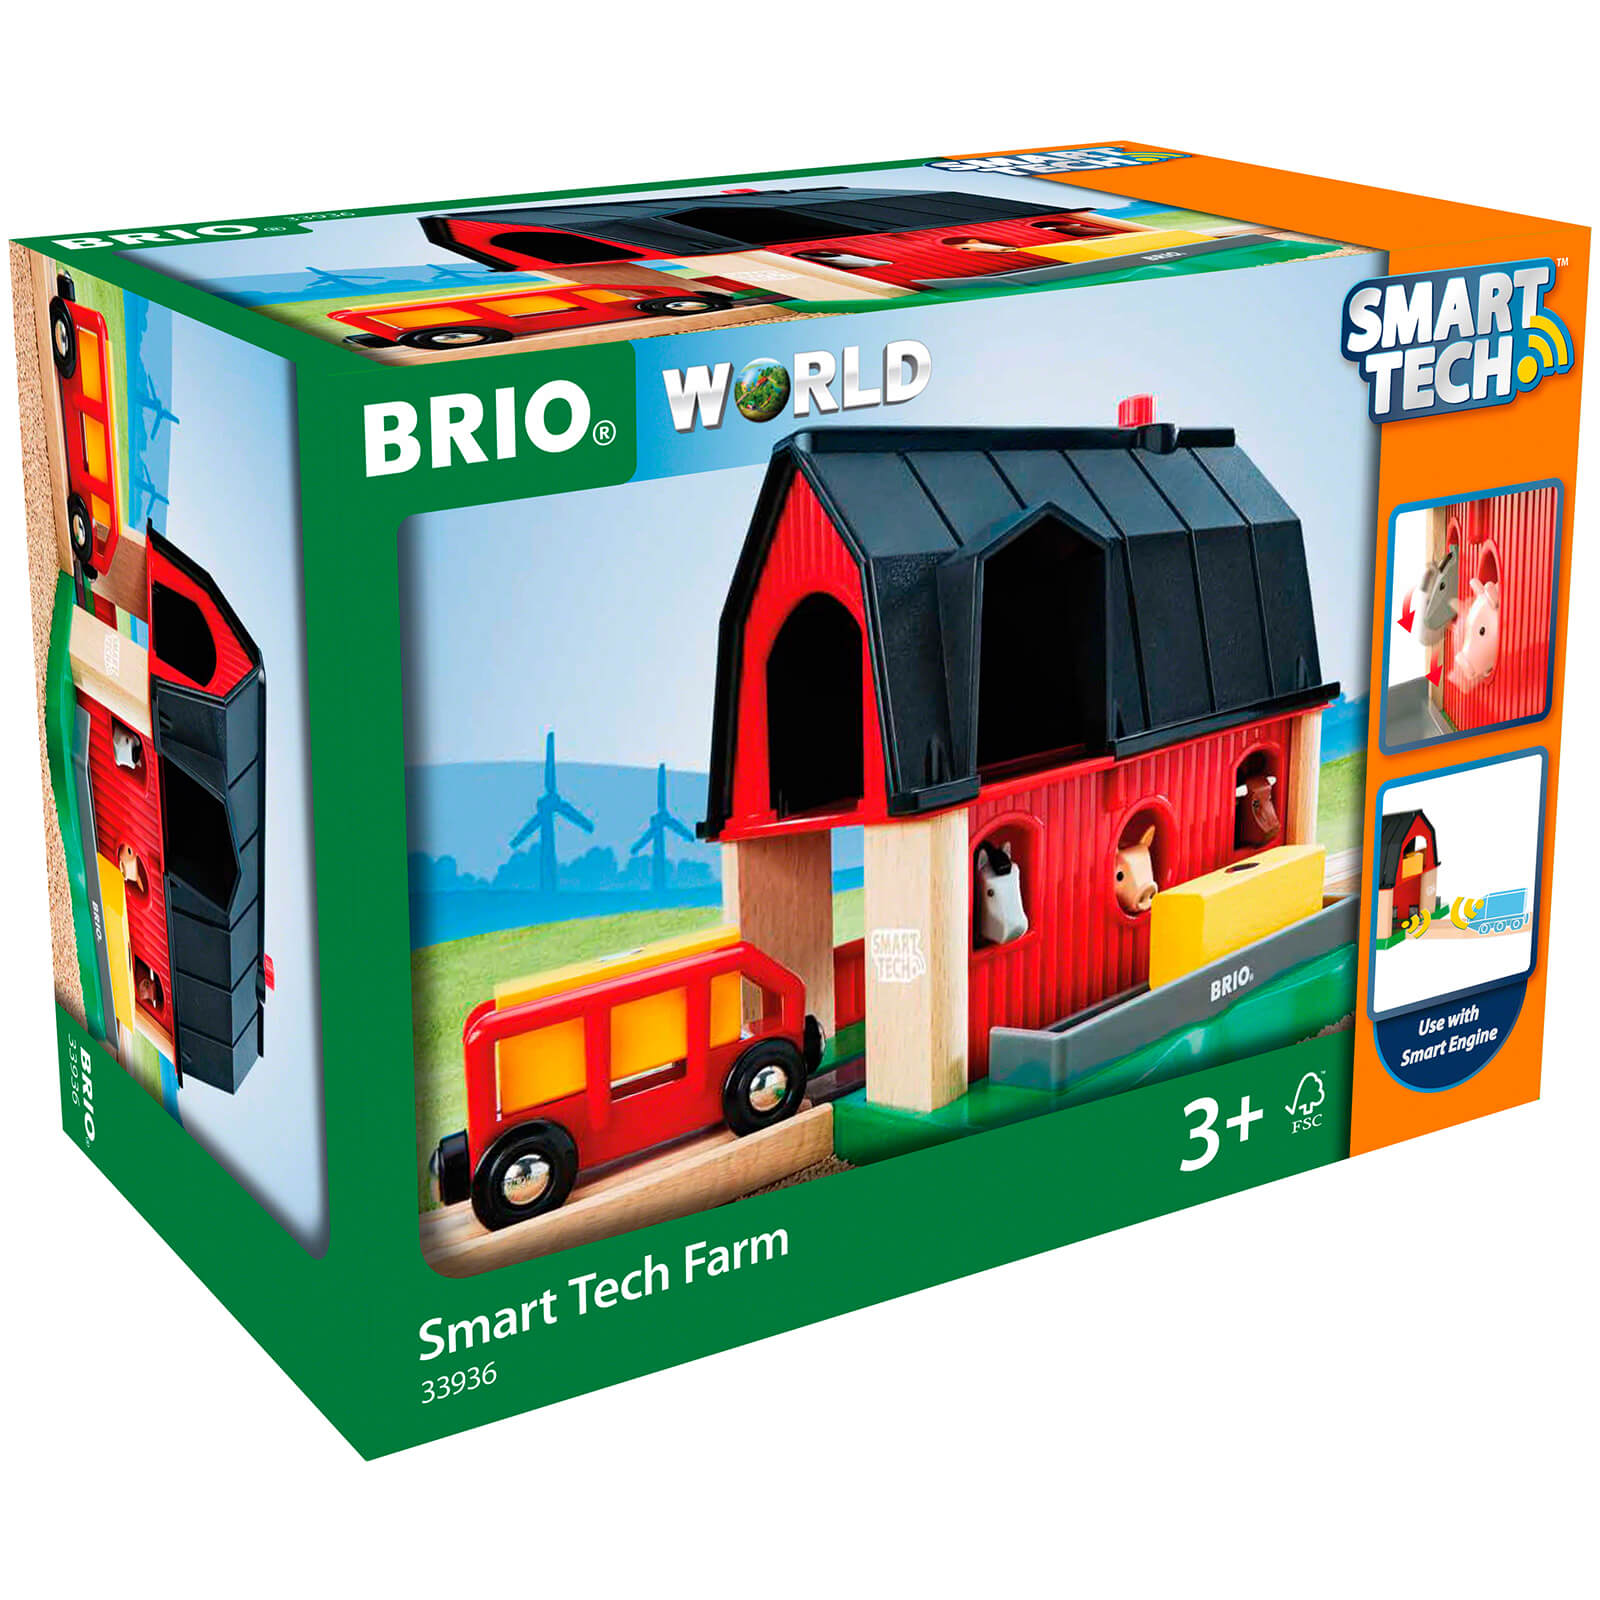 Brio Smart Tech – Railway Farm Barn